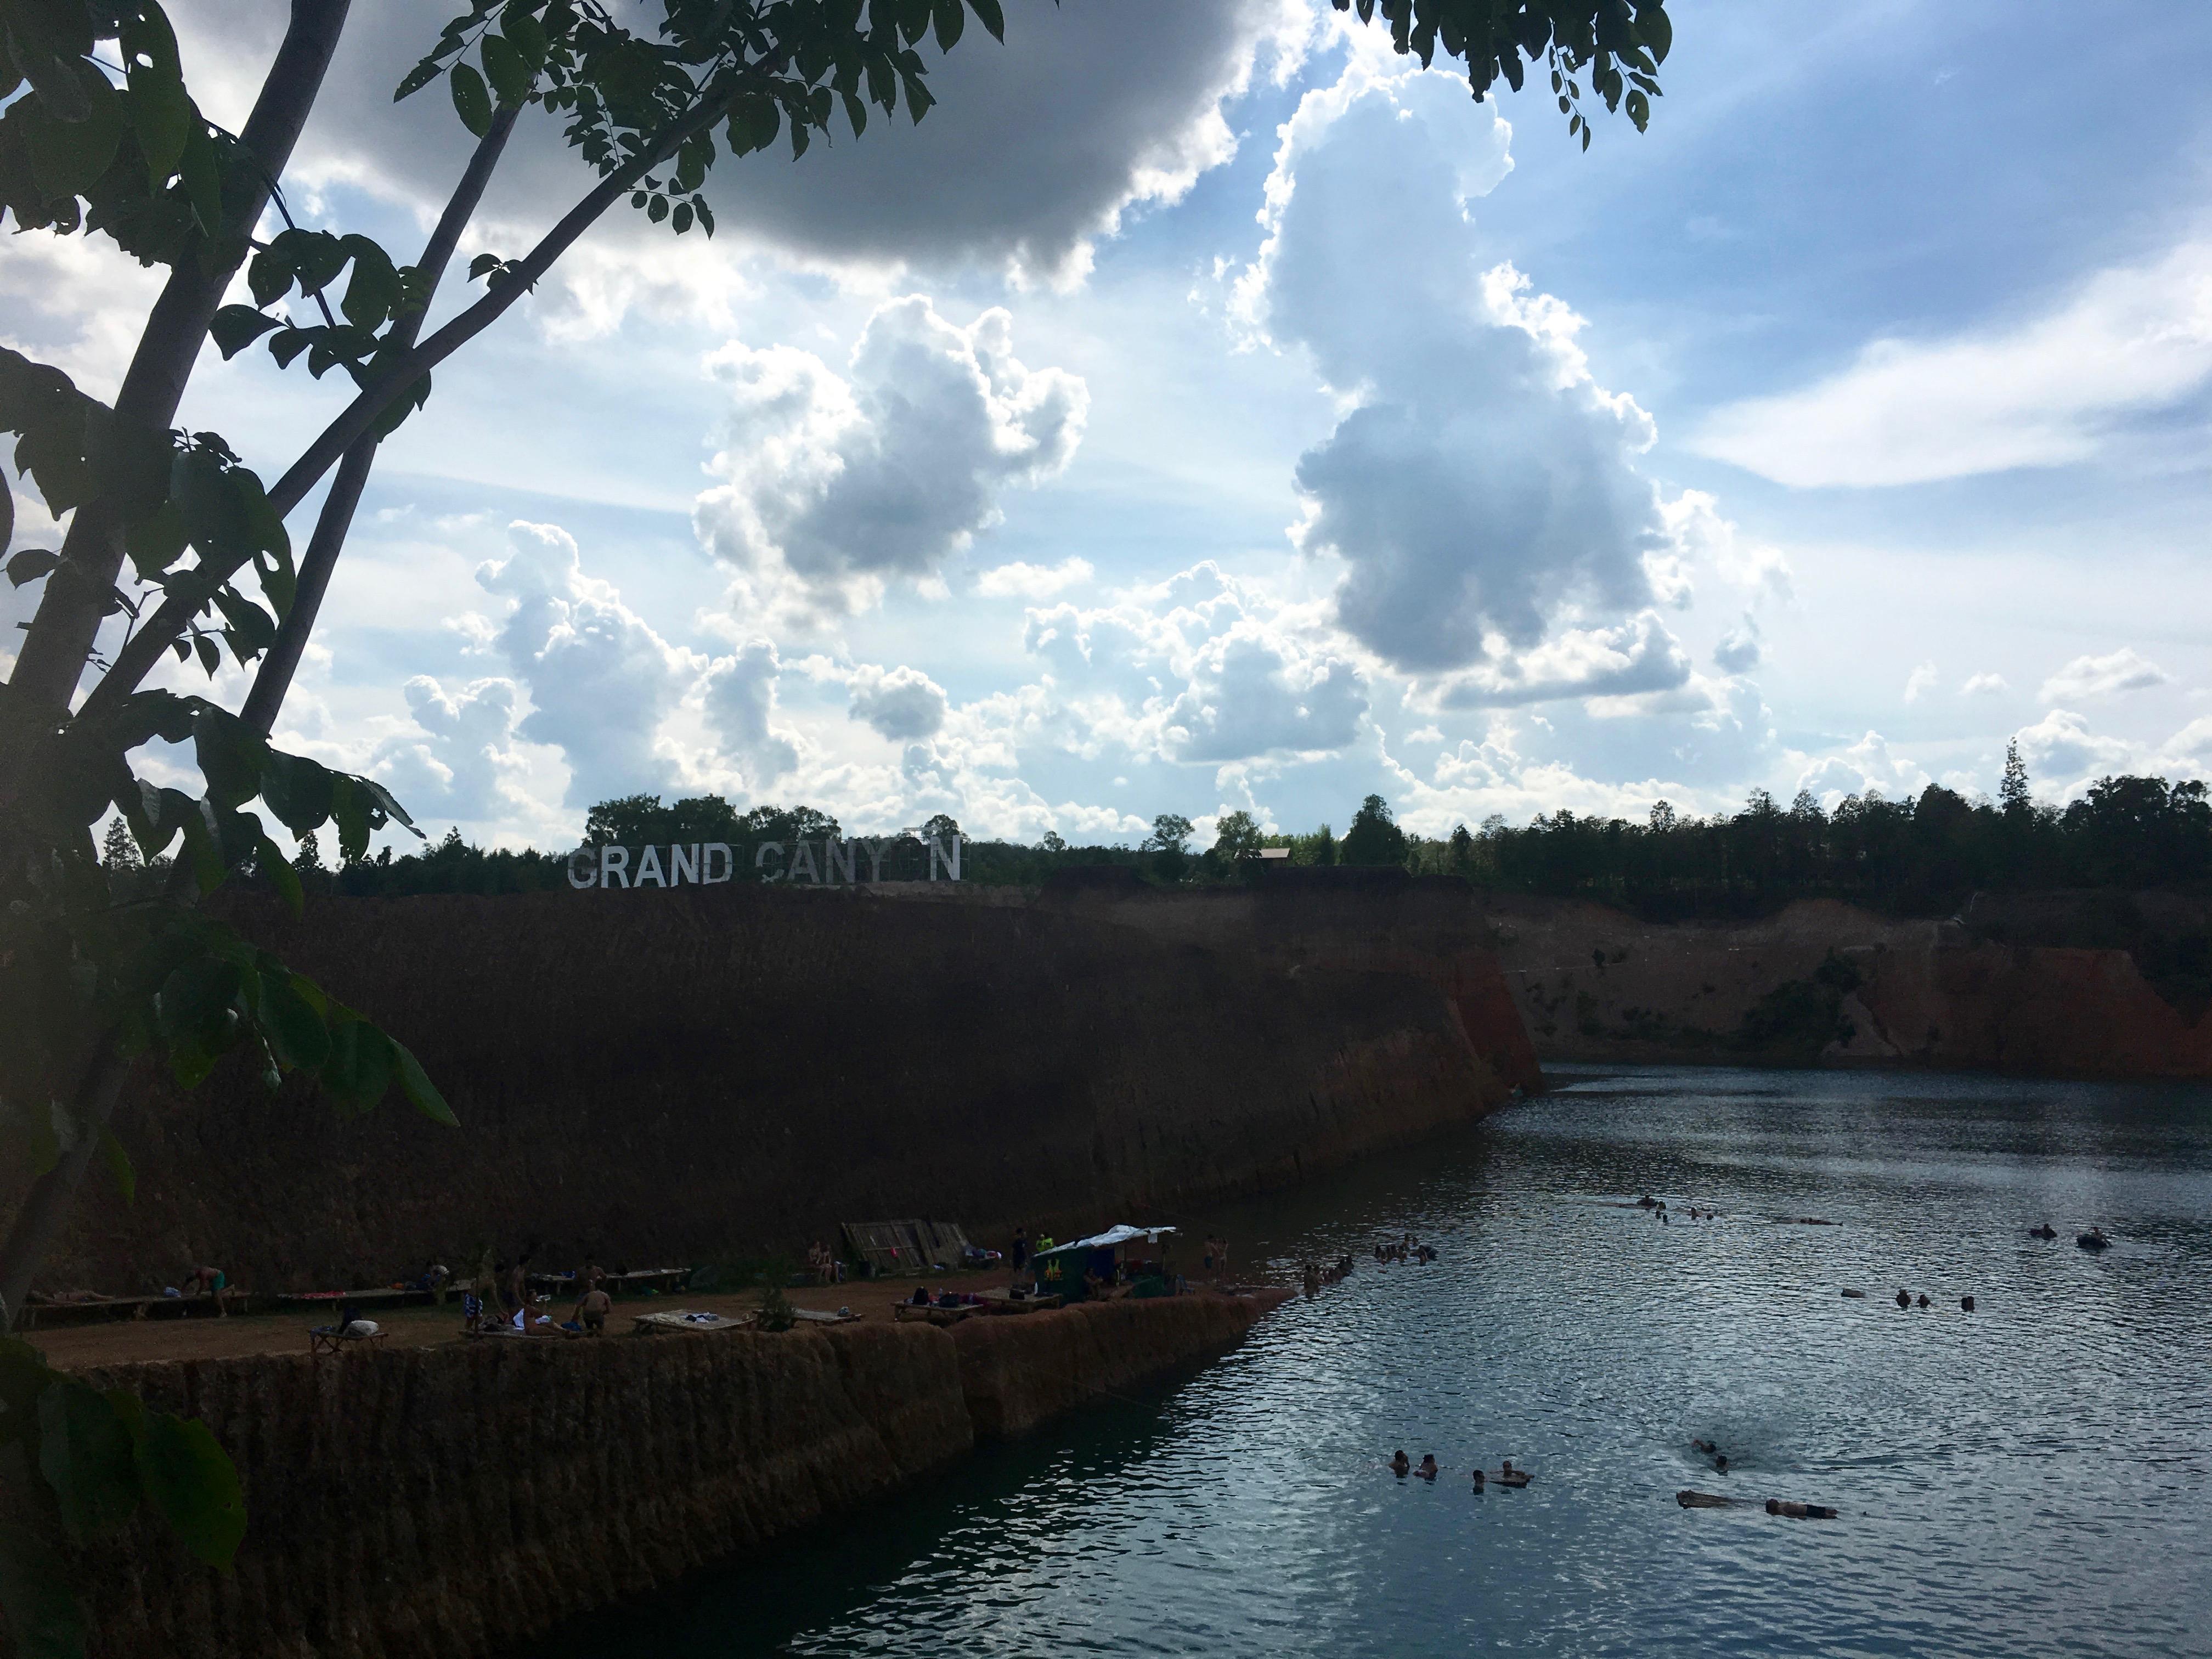 Grand Canyon-Chiang Mai